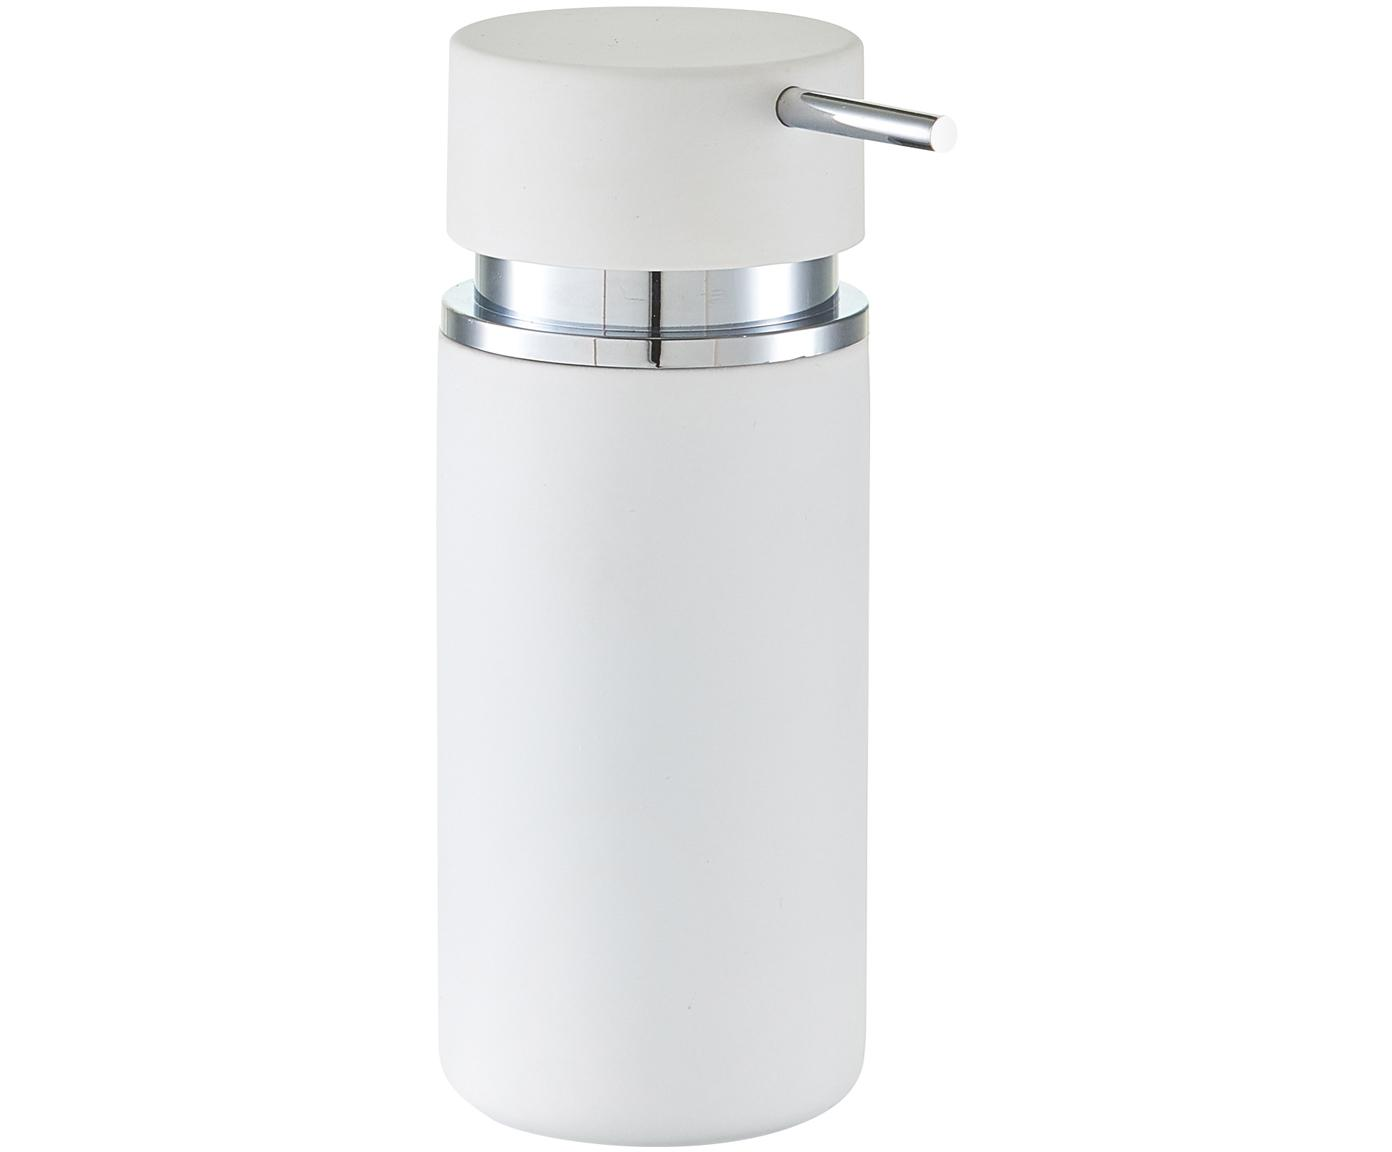 Keramik-Seifenspender Mateo, Pumpkopf: Kunststoff, verchromt, Weiß, Chrom, Ø 7 x H 17 cm